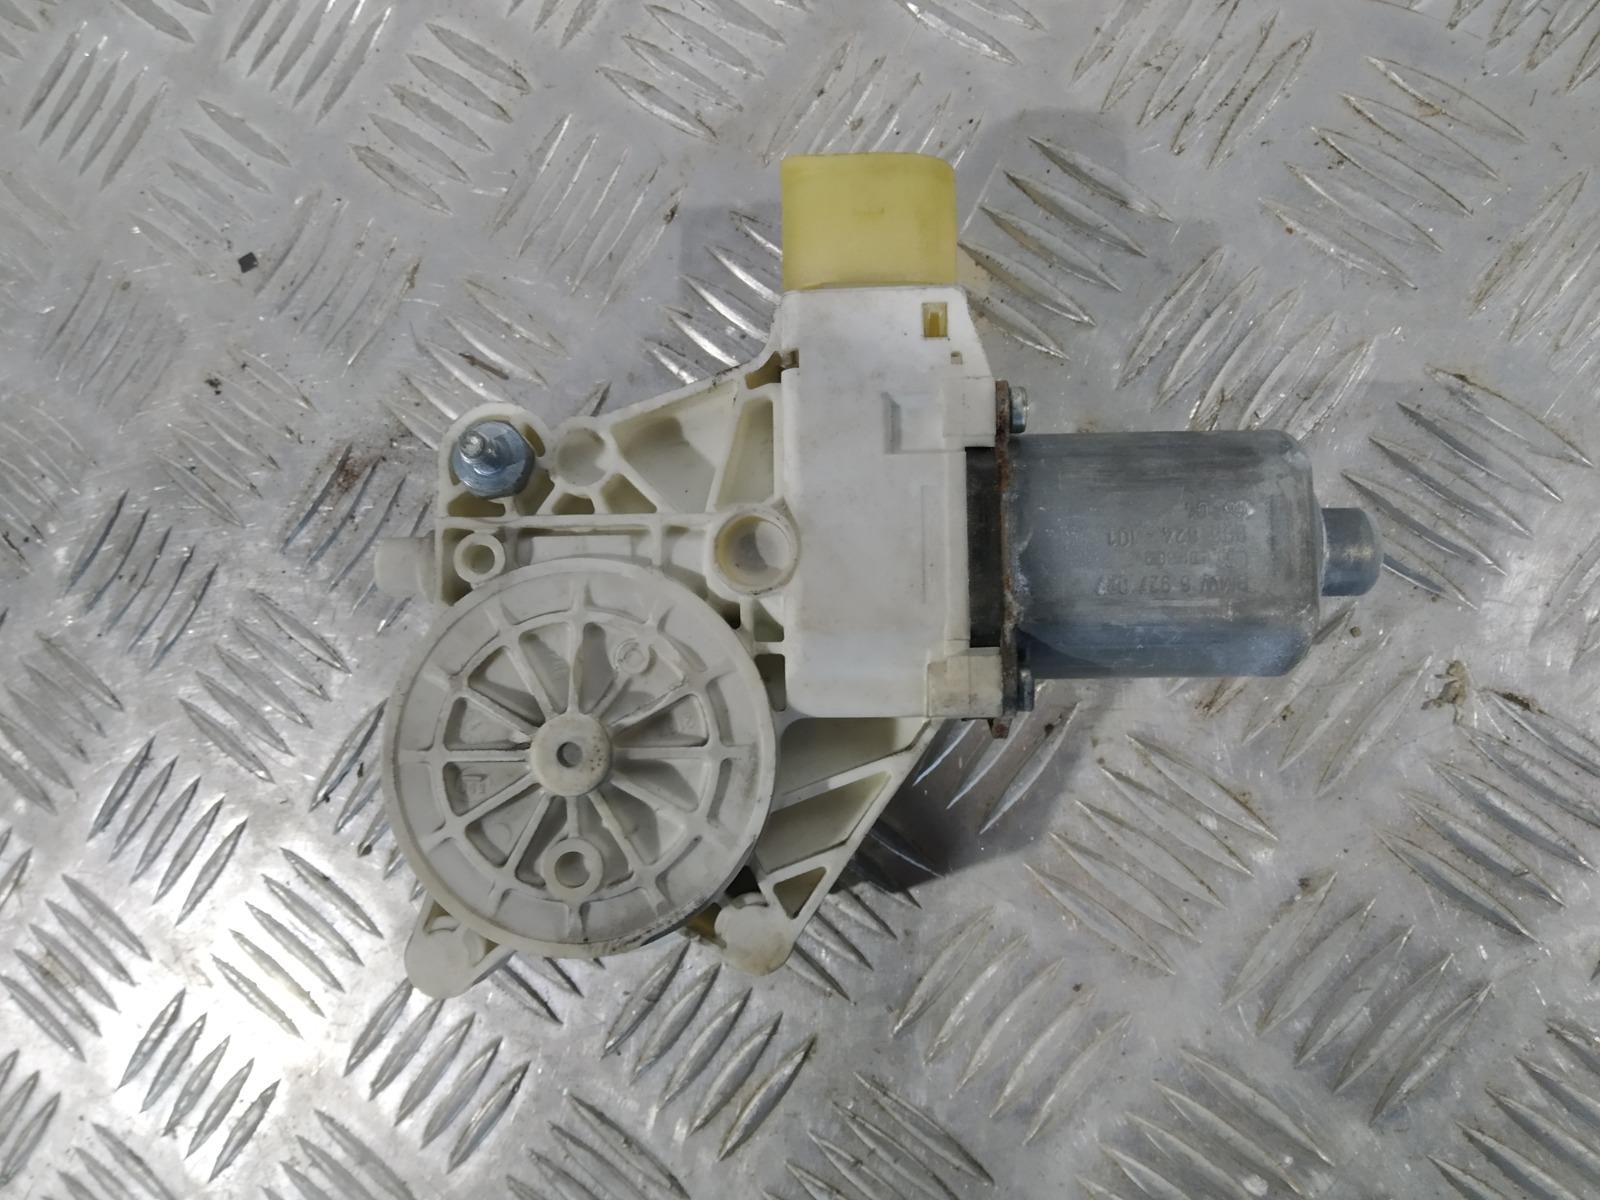 Моторчик стеклоподъемника передний левый Bmw 1 E87 2.0 TD 2006 (б/у)